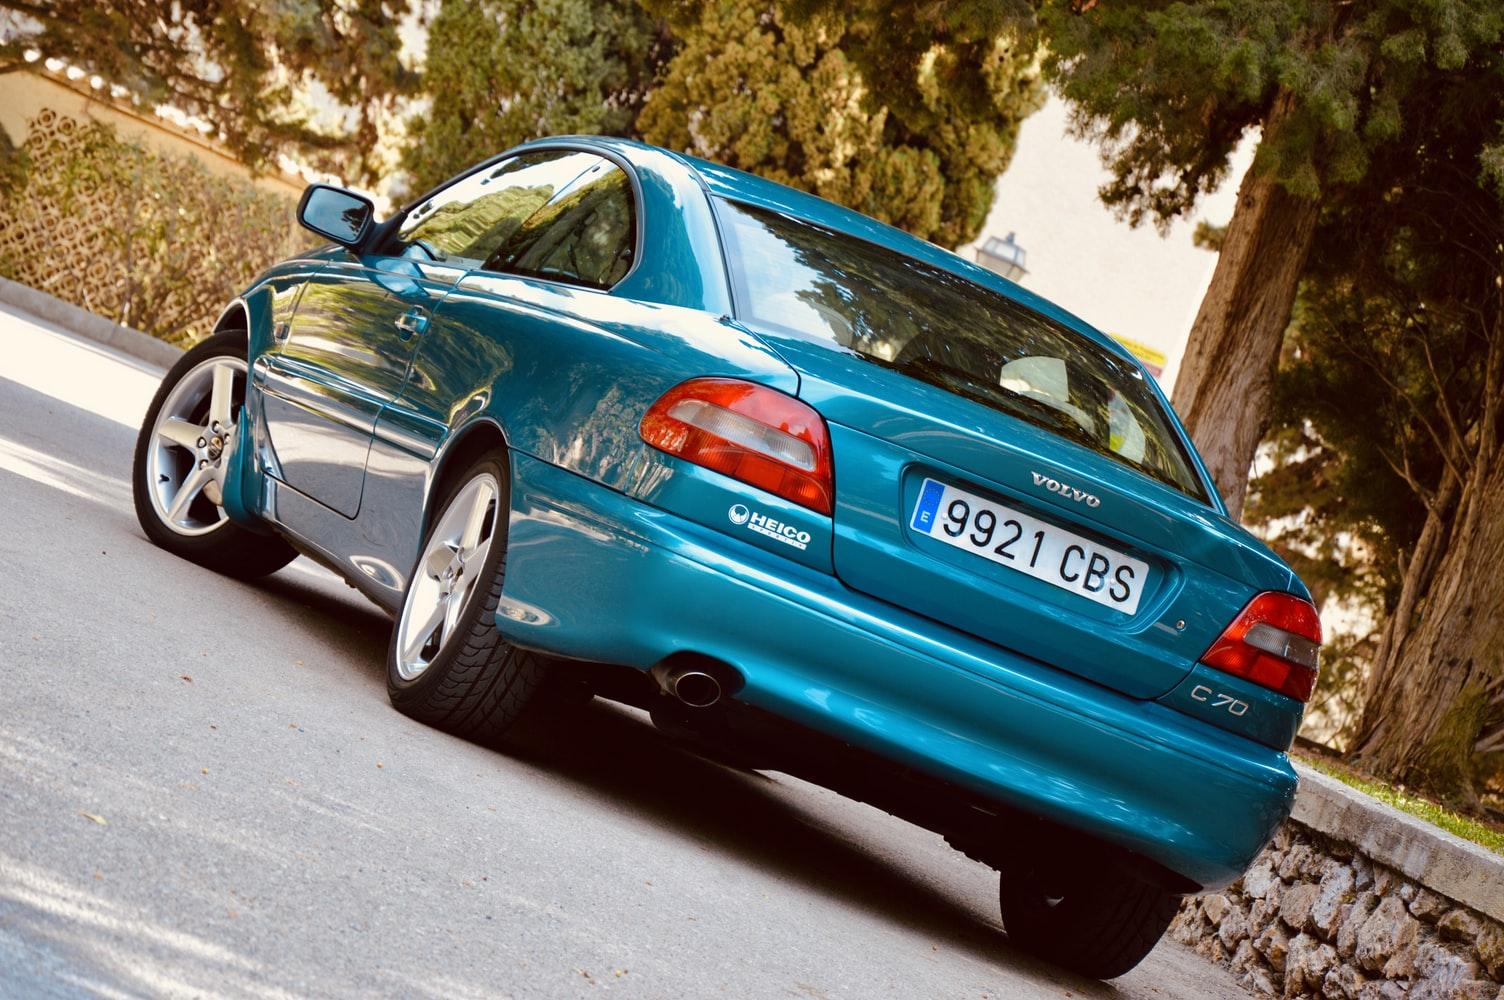 Volvo 70 C70 Coupe 1997 ManuelMena Unsplashphoto photo-1574935414486-c84c8187c2fd